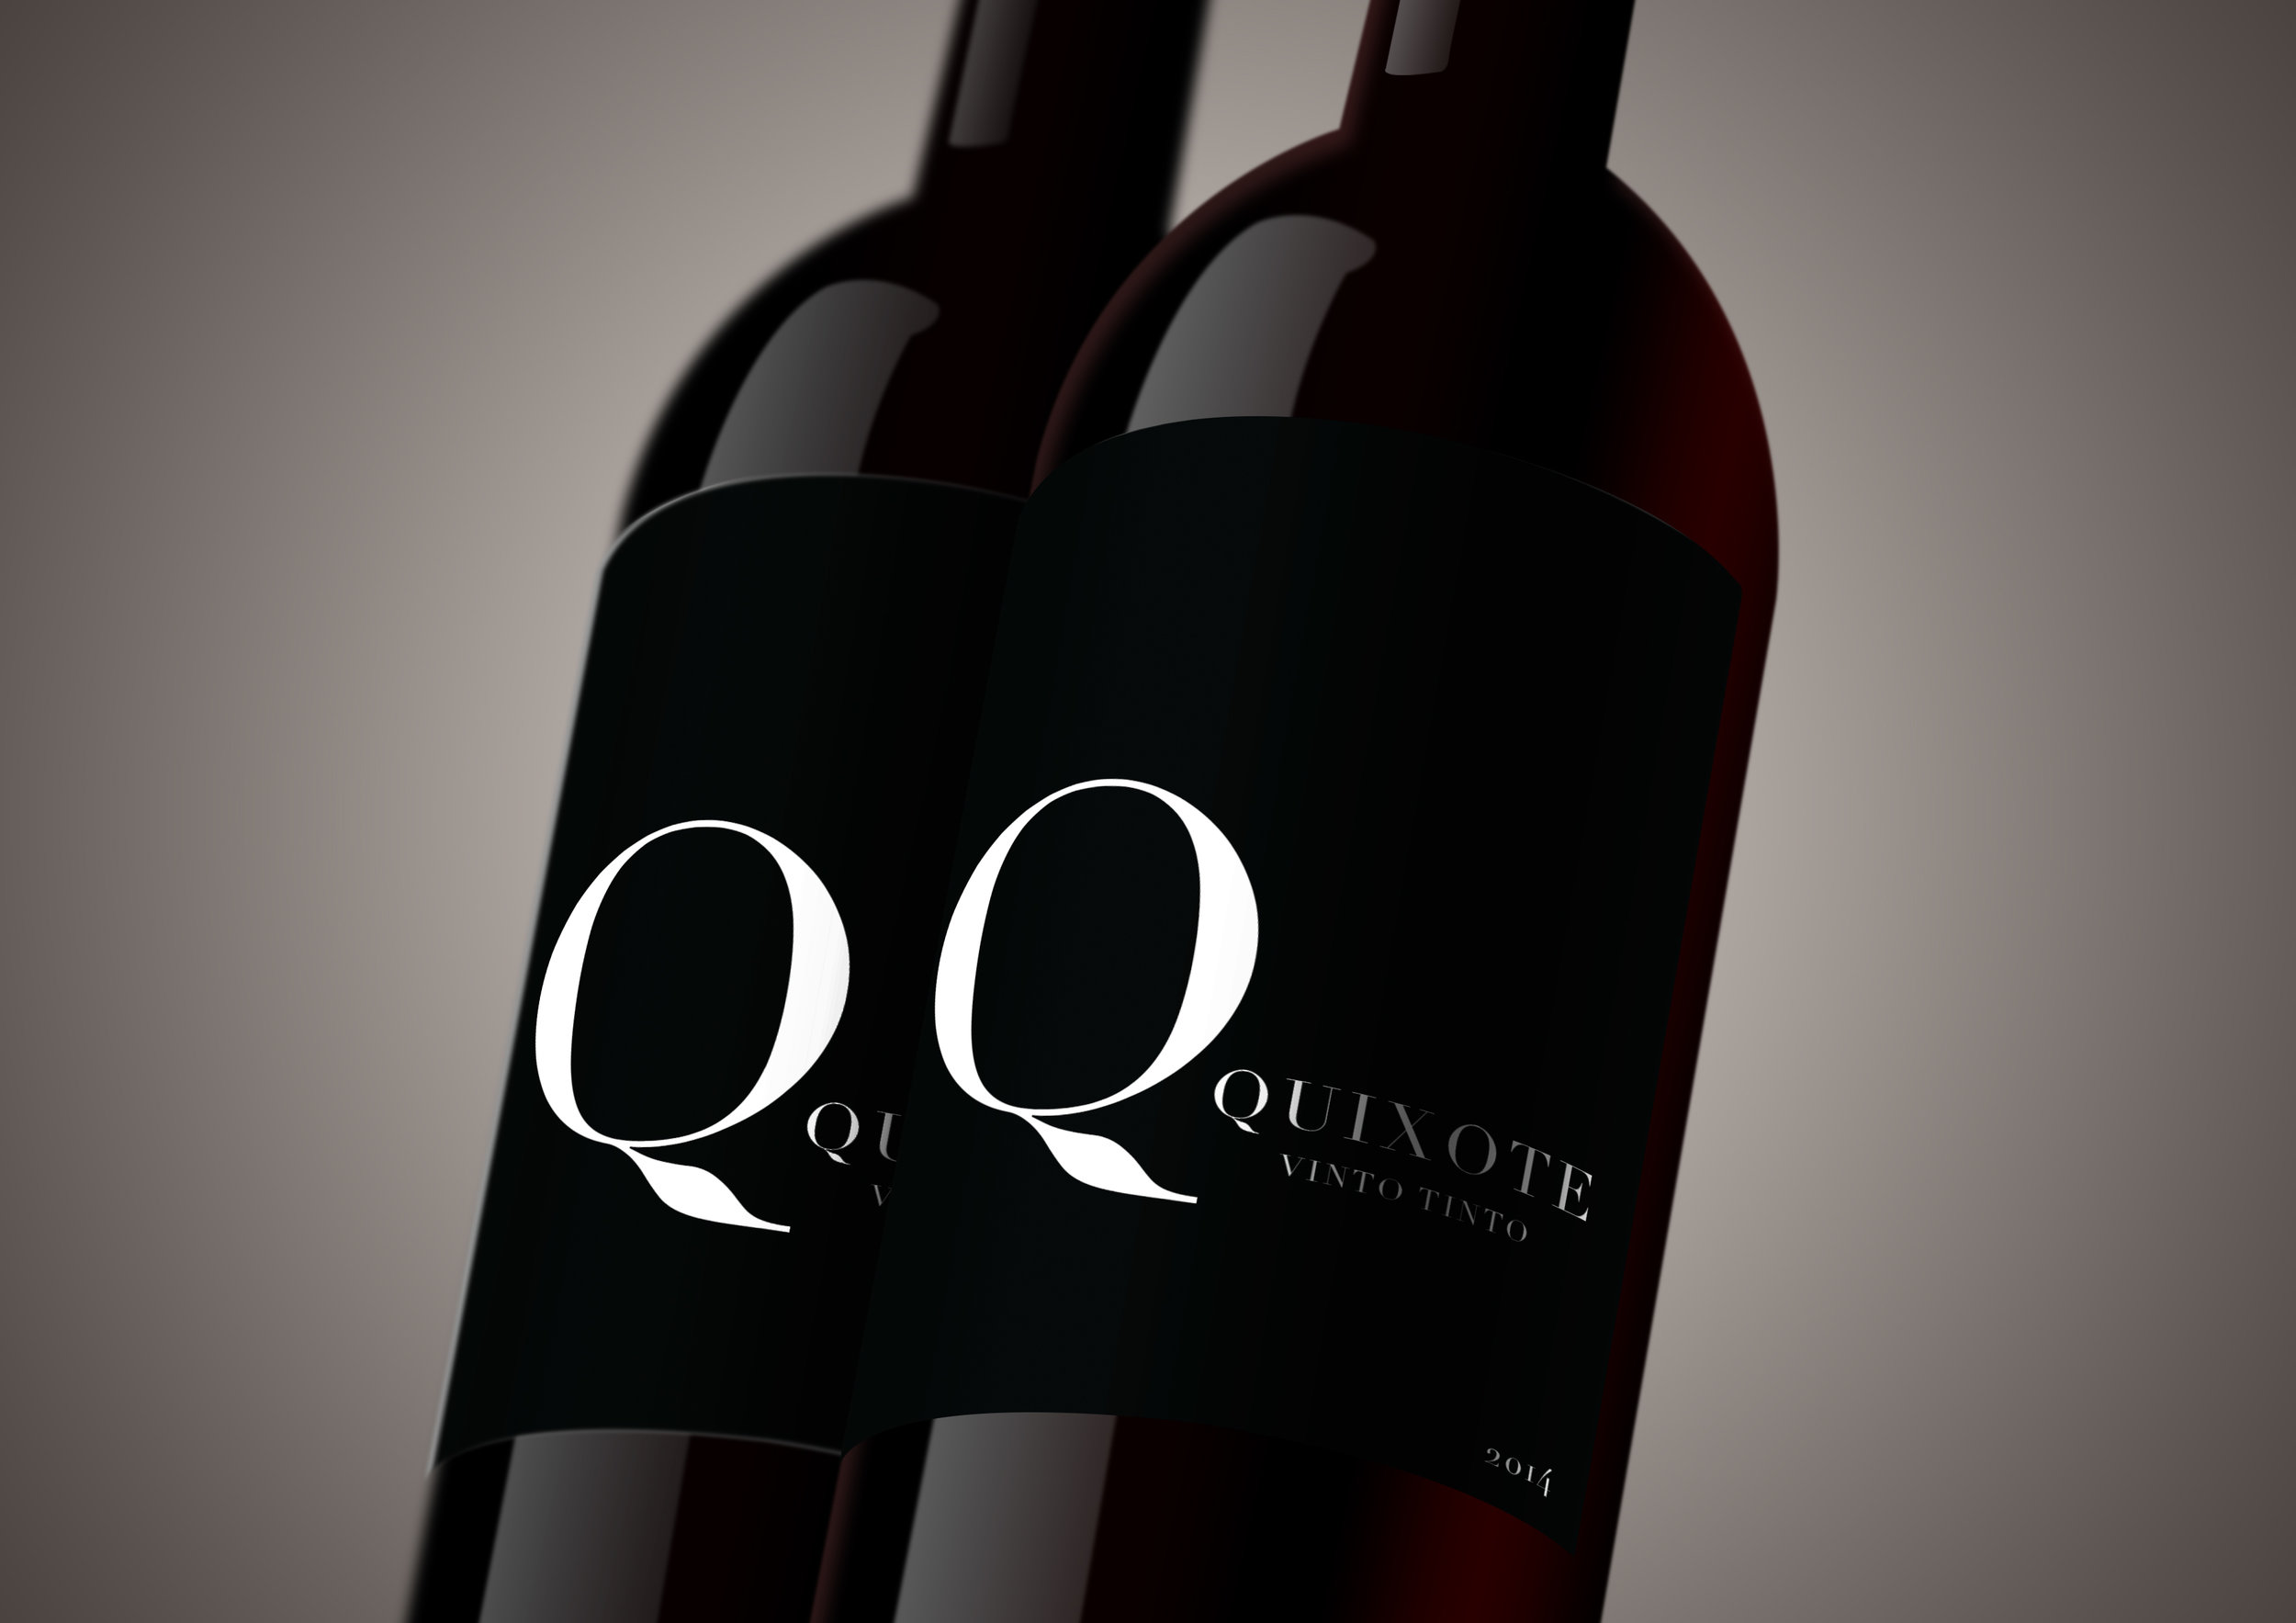 Quixote 2 bottle shot.jpg